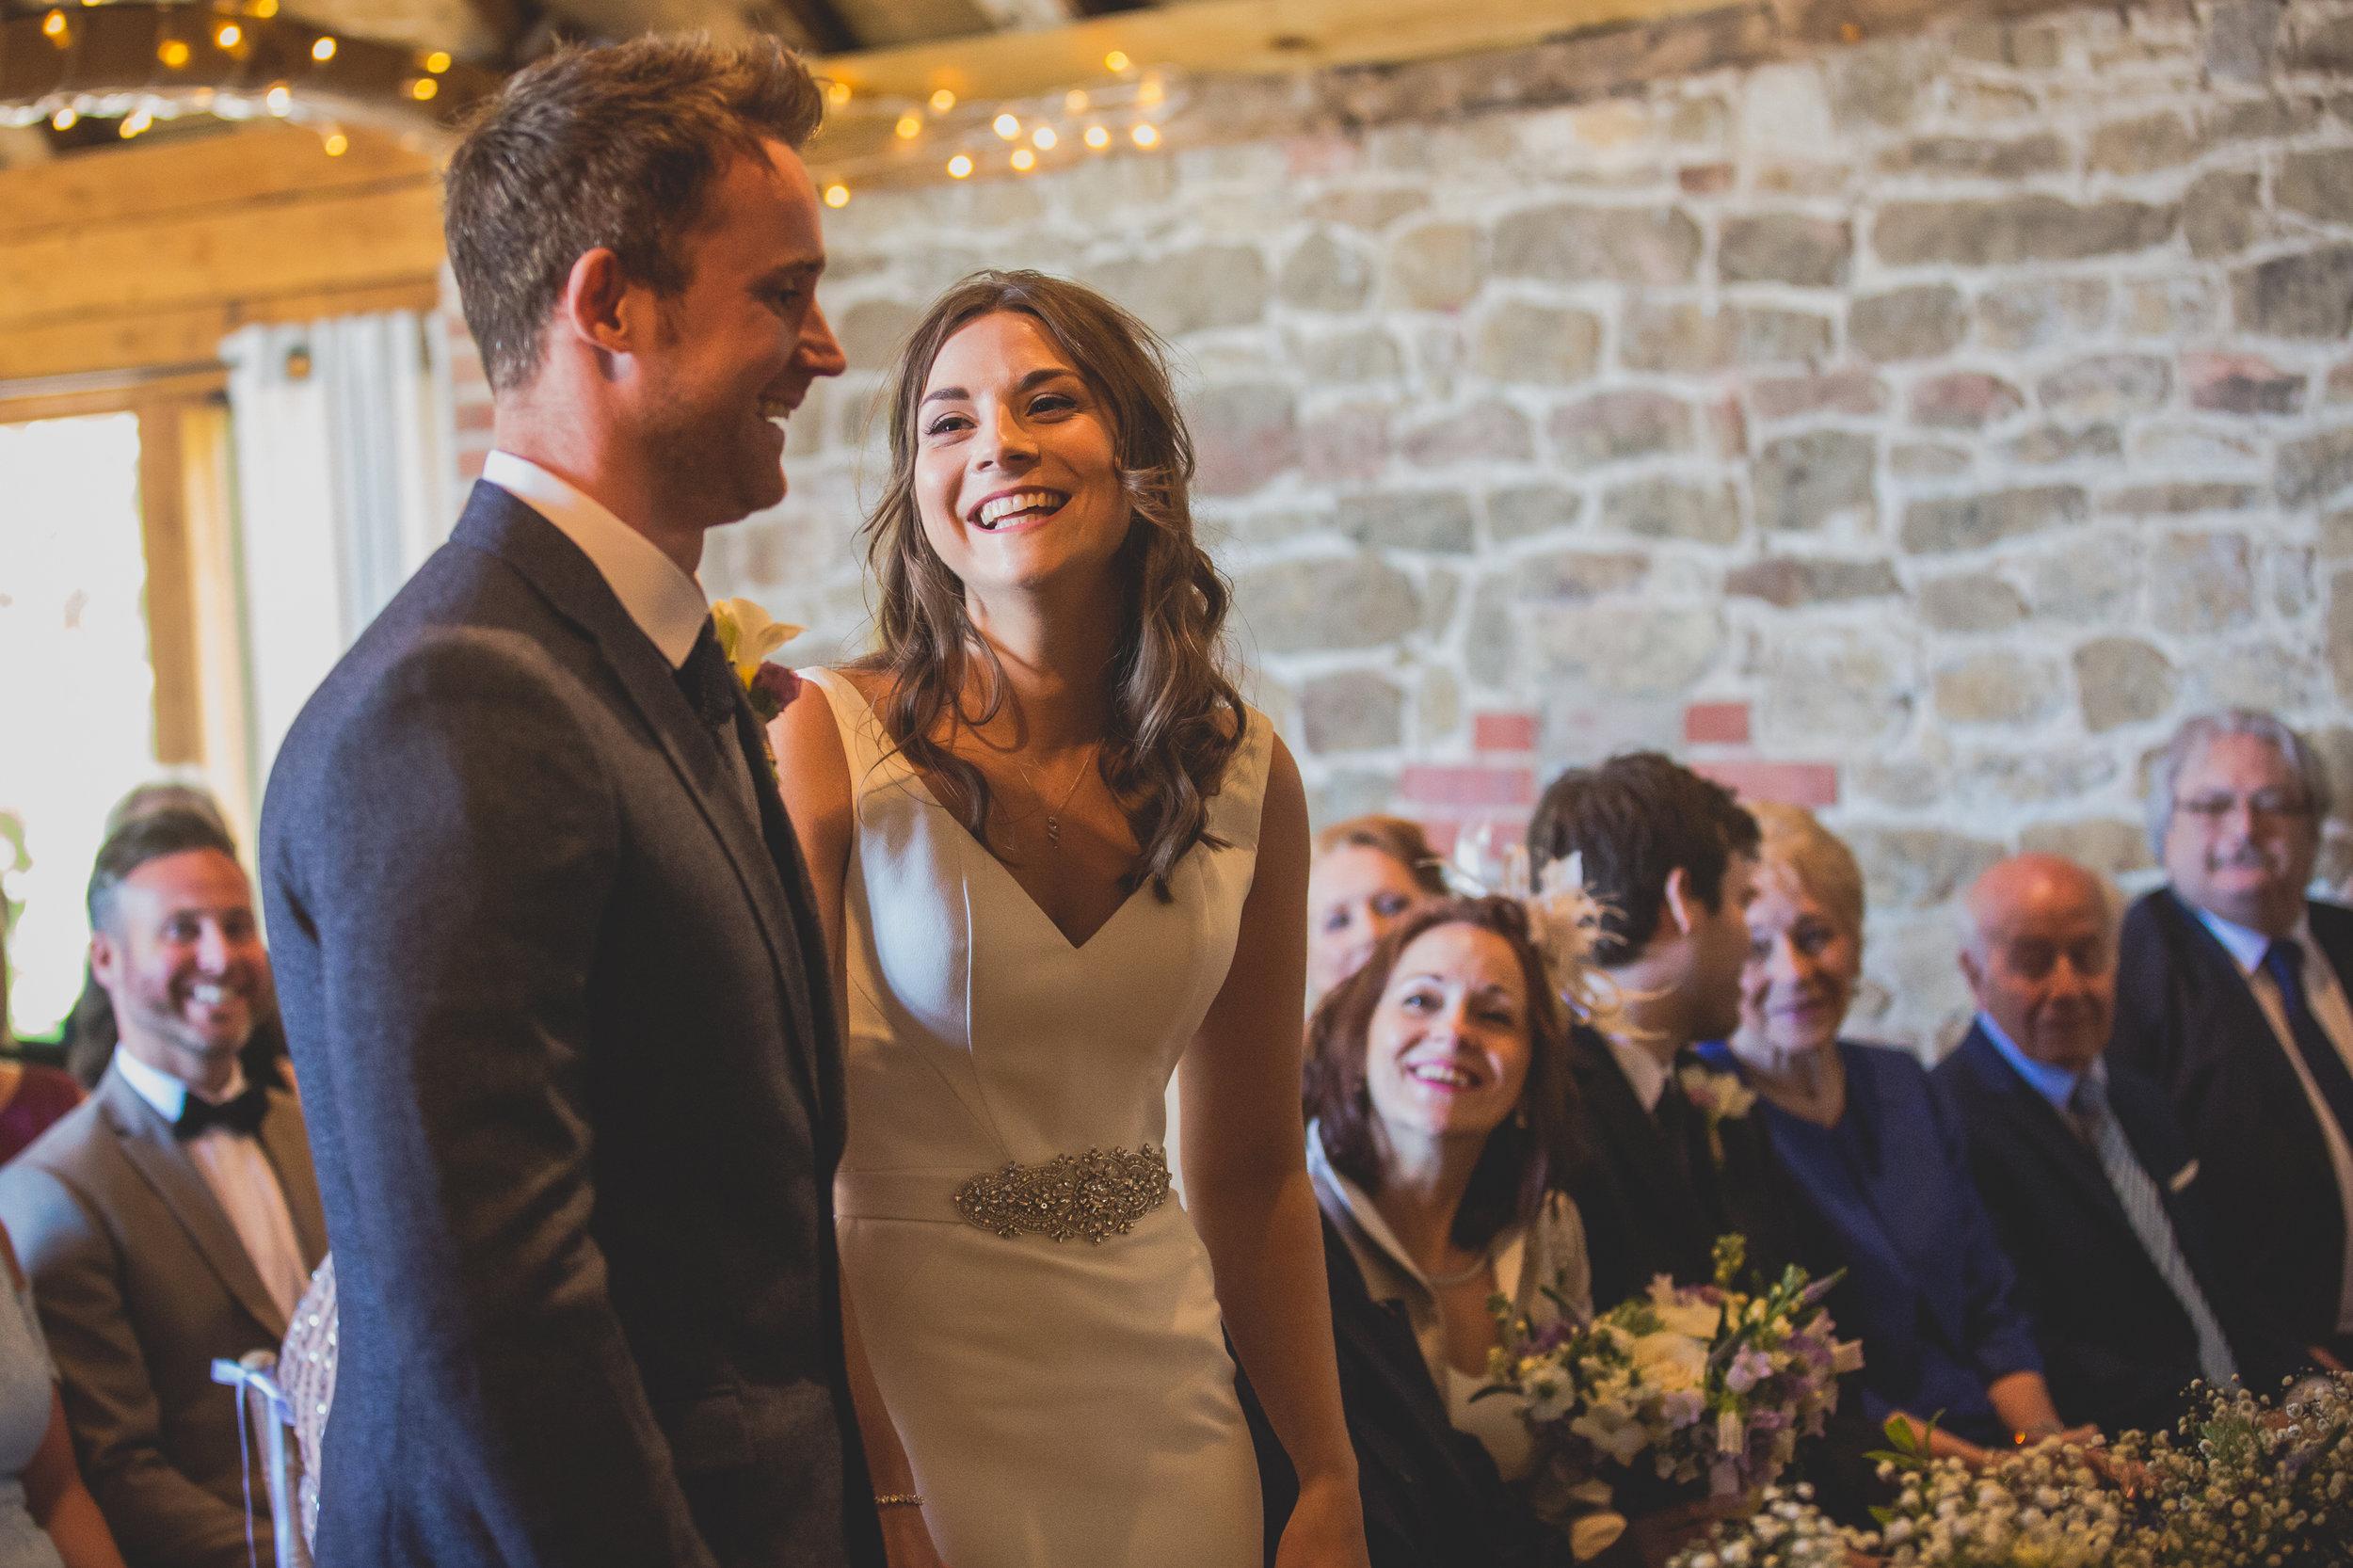 Grittenham Barn female wedding photographers west sussex petworth social-54.jpg